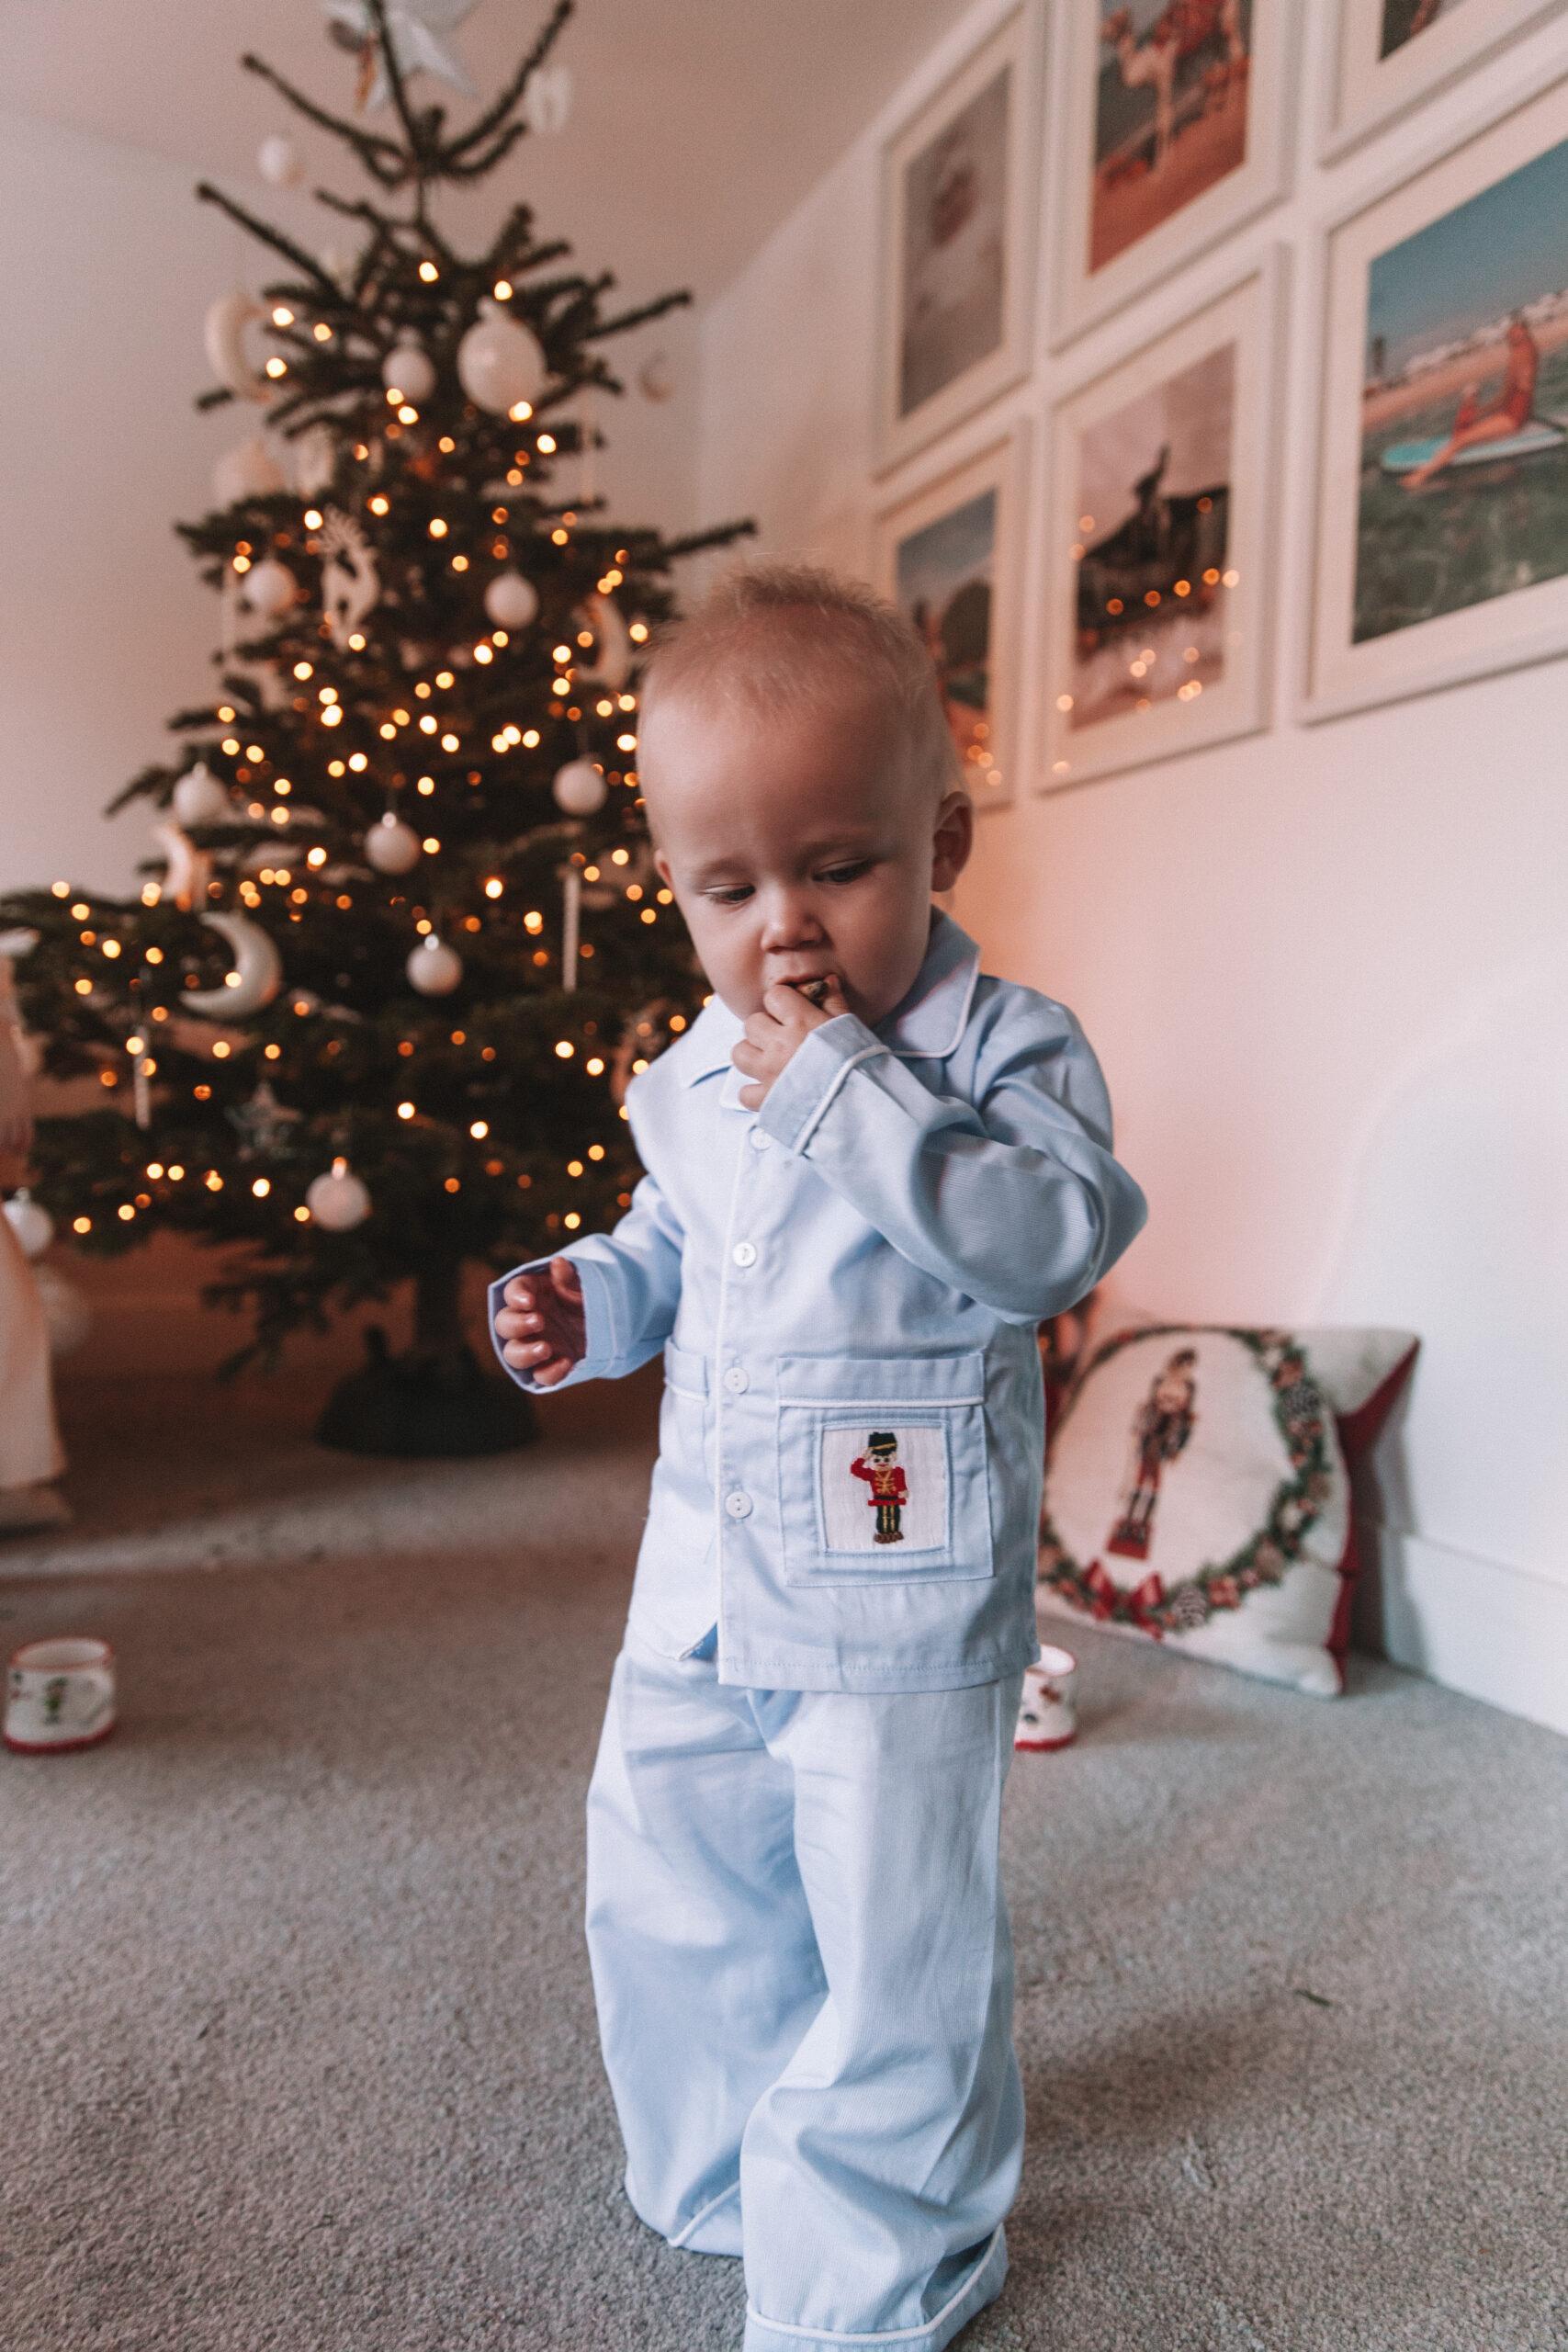 Childrensalon_Caramelo_Kids_Hand-Smocked_Cotton_Pyjamas_04